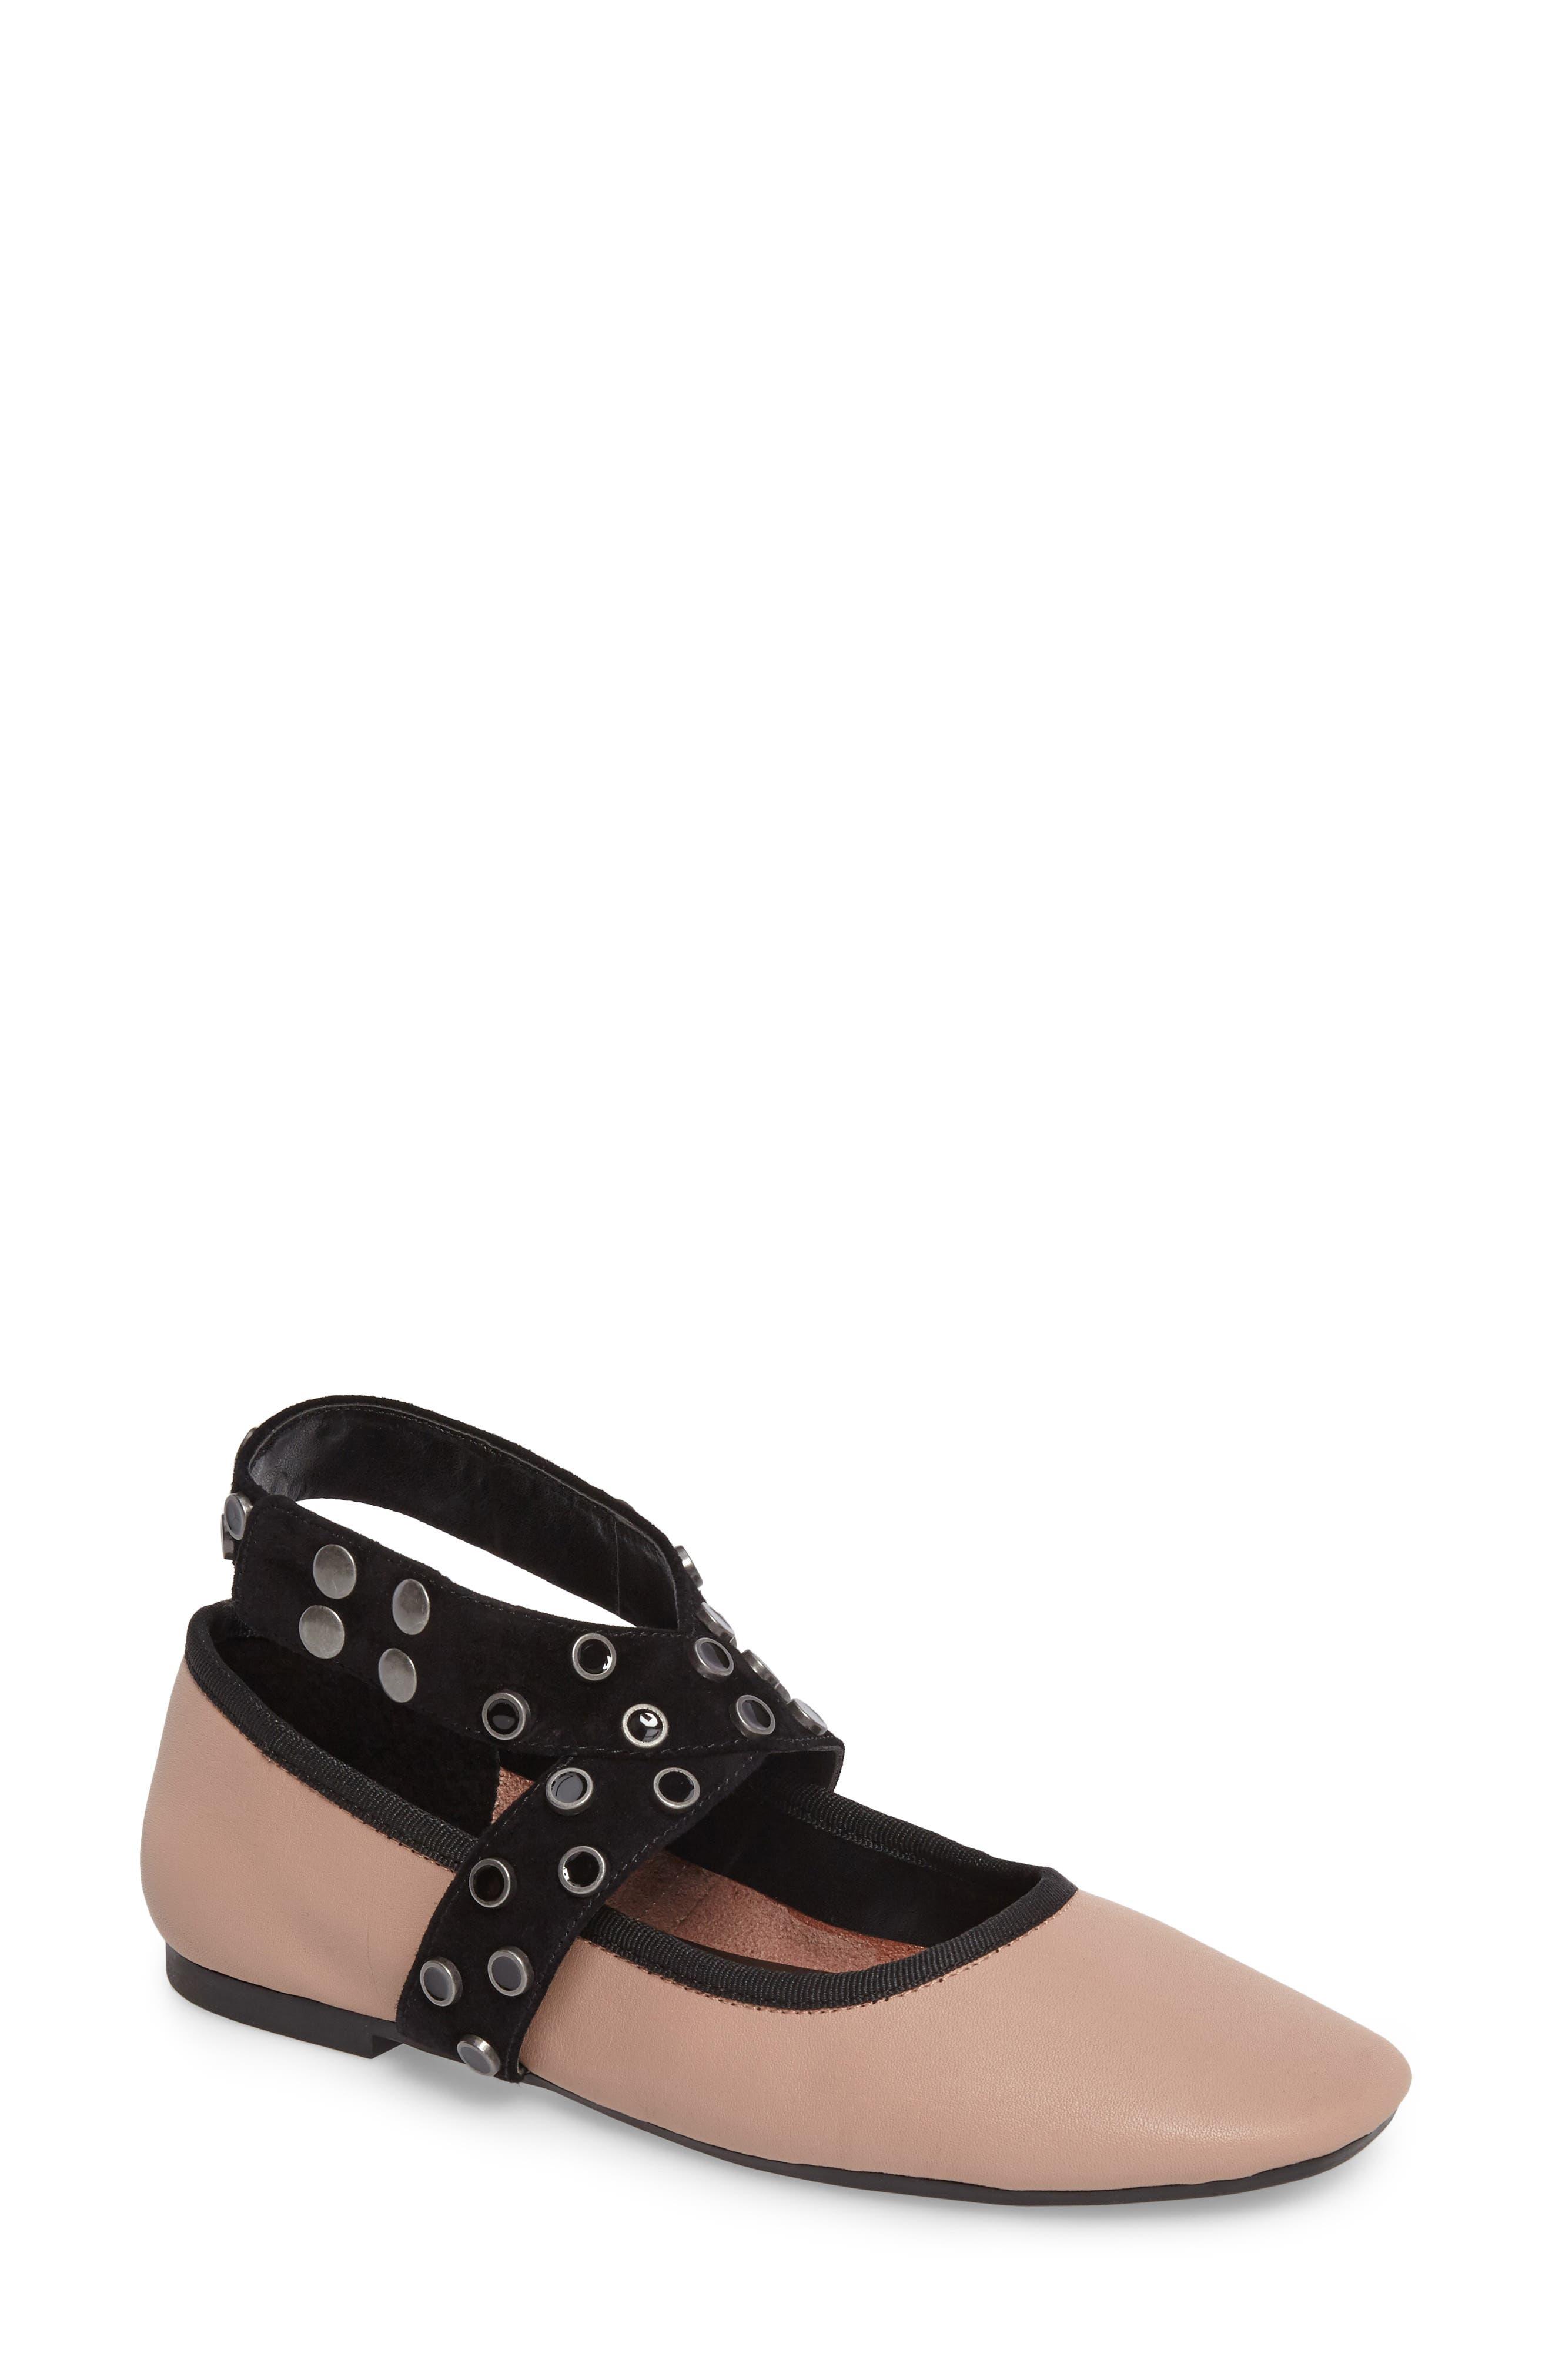 M4D3 Carla Wraparound Ankle Strap Flat,                         Main,                         color, Blush Leather